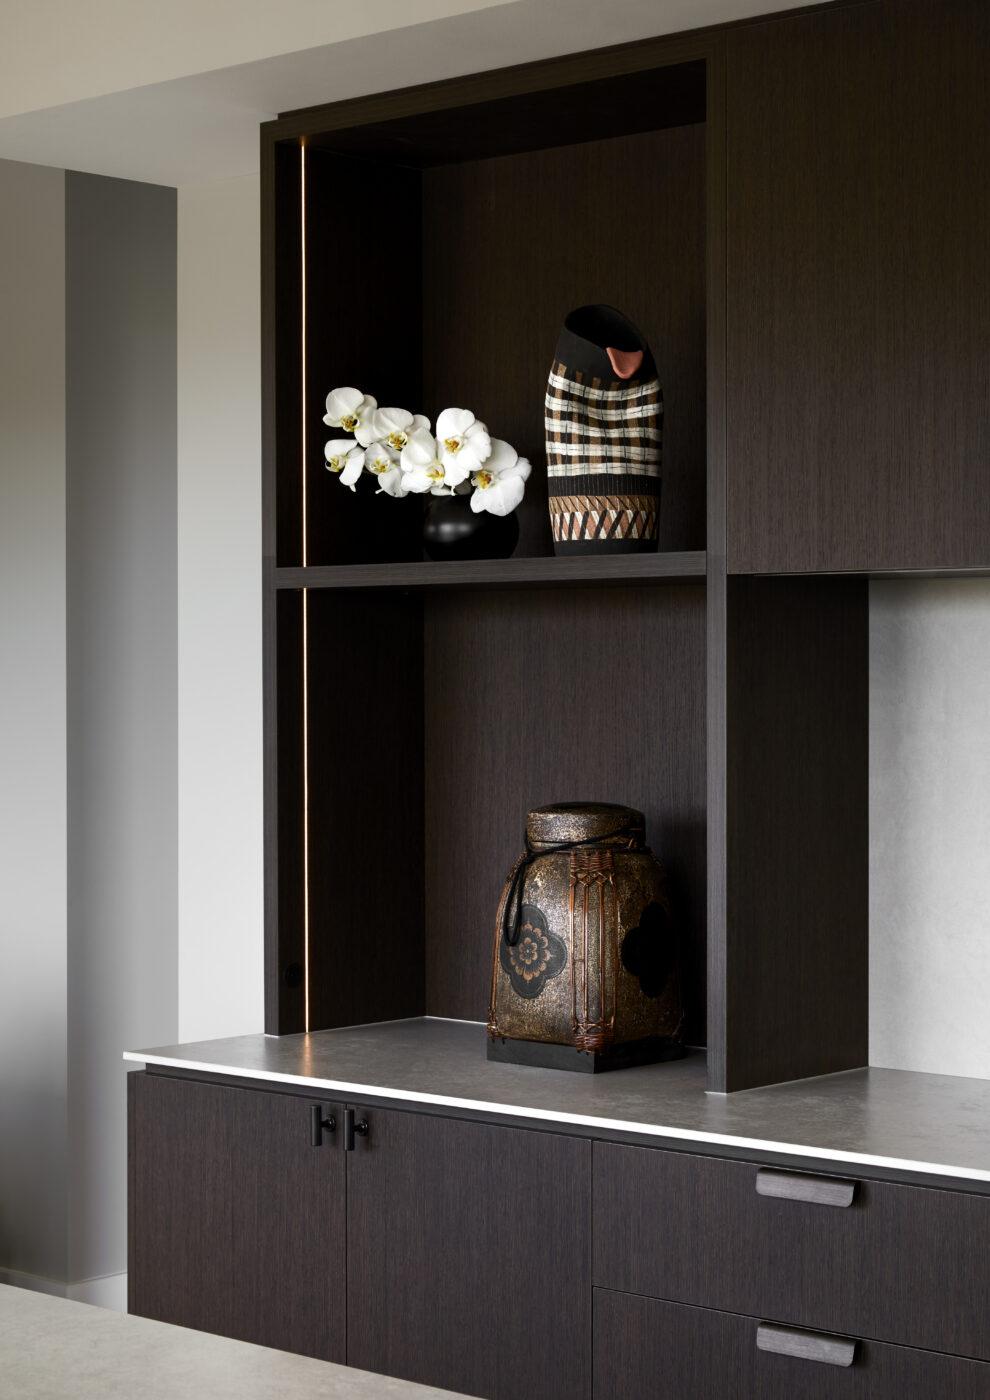 Camilla-Molders-Design-Interior-Design-Decoration-Melbourne-Hawthorn-Apartment-Renovation